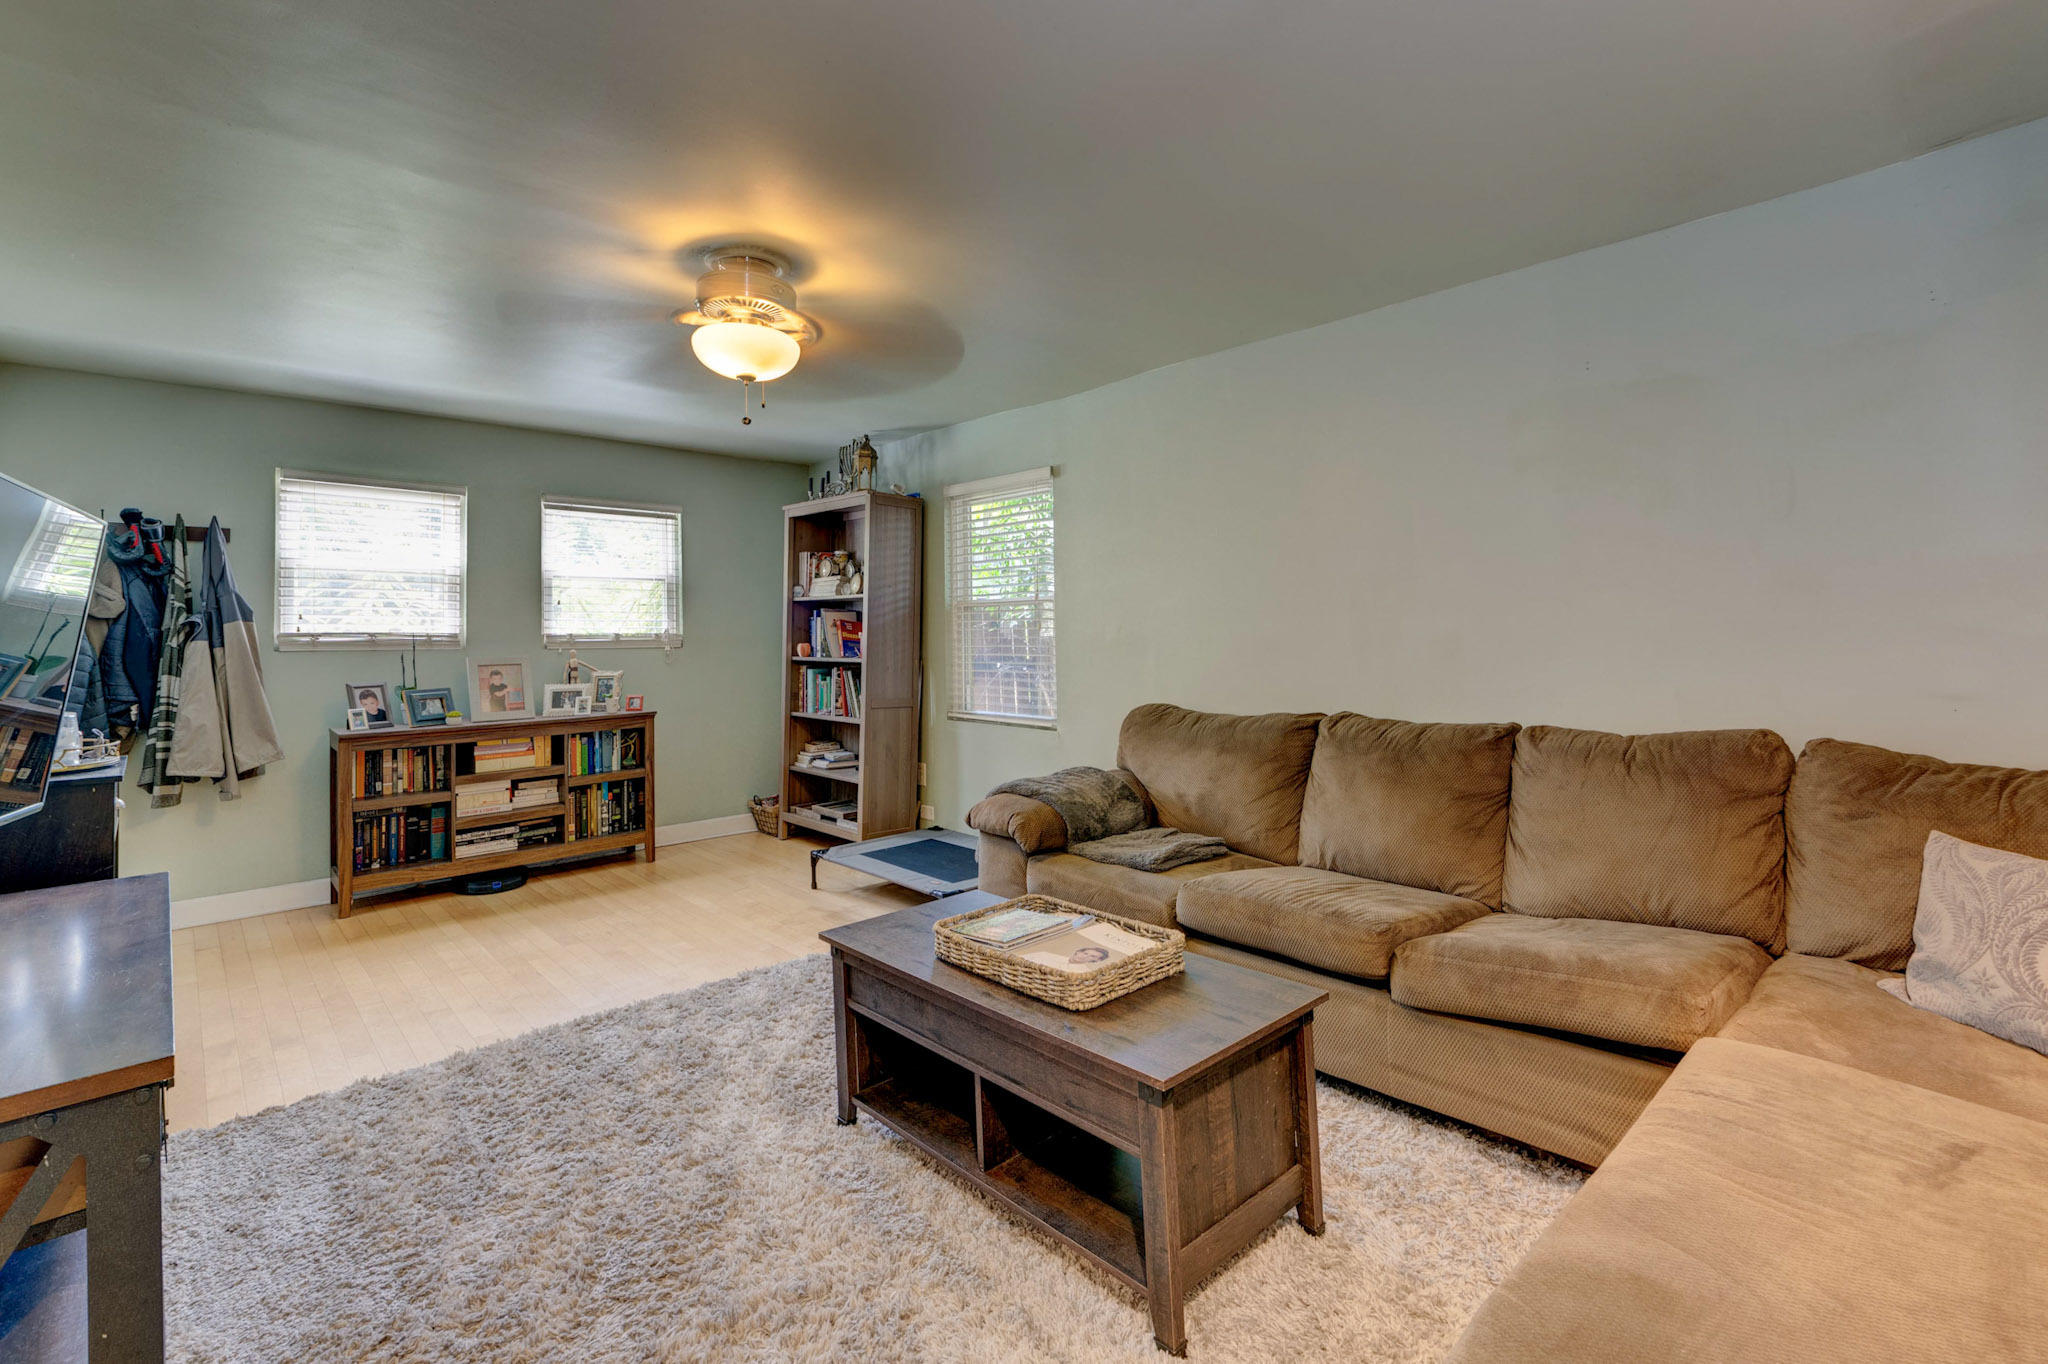 St Andrews Homes For Sale - 1808 2nd, Charleston, SC - 15